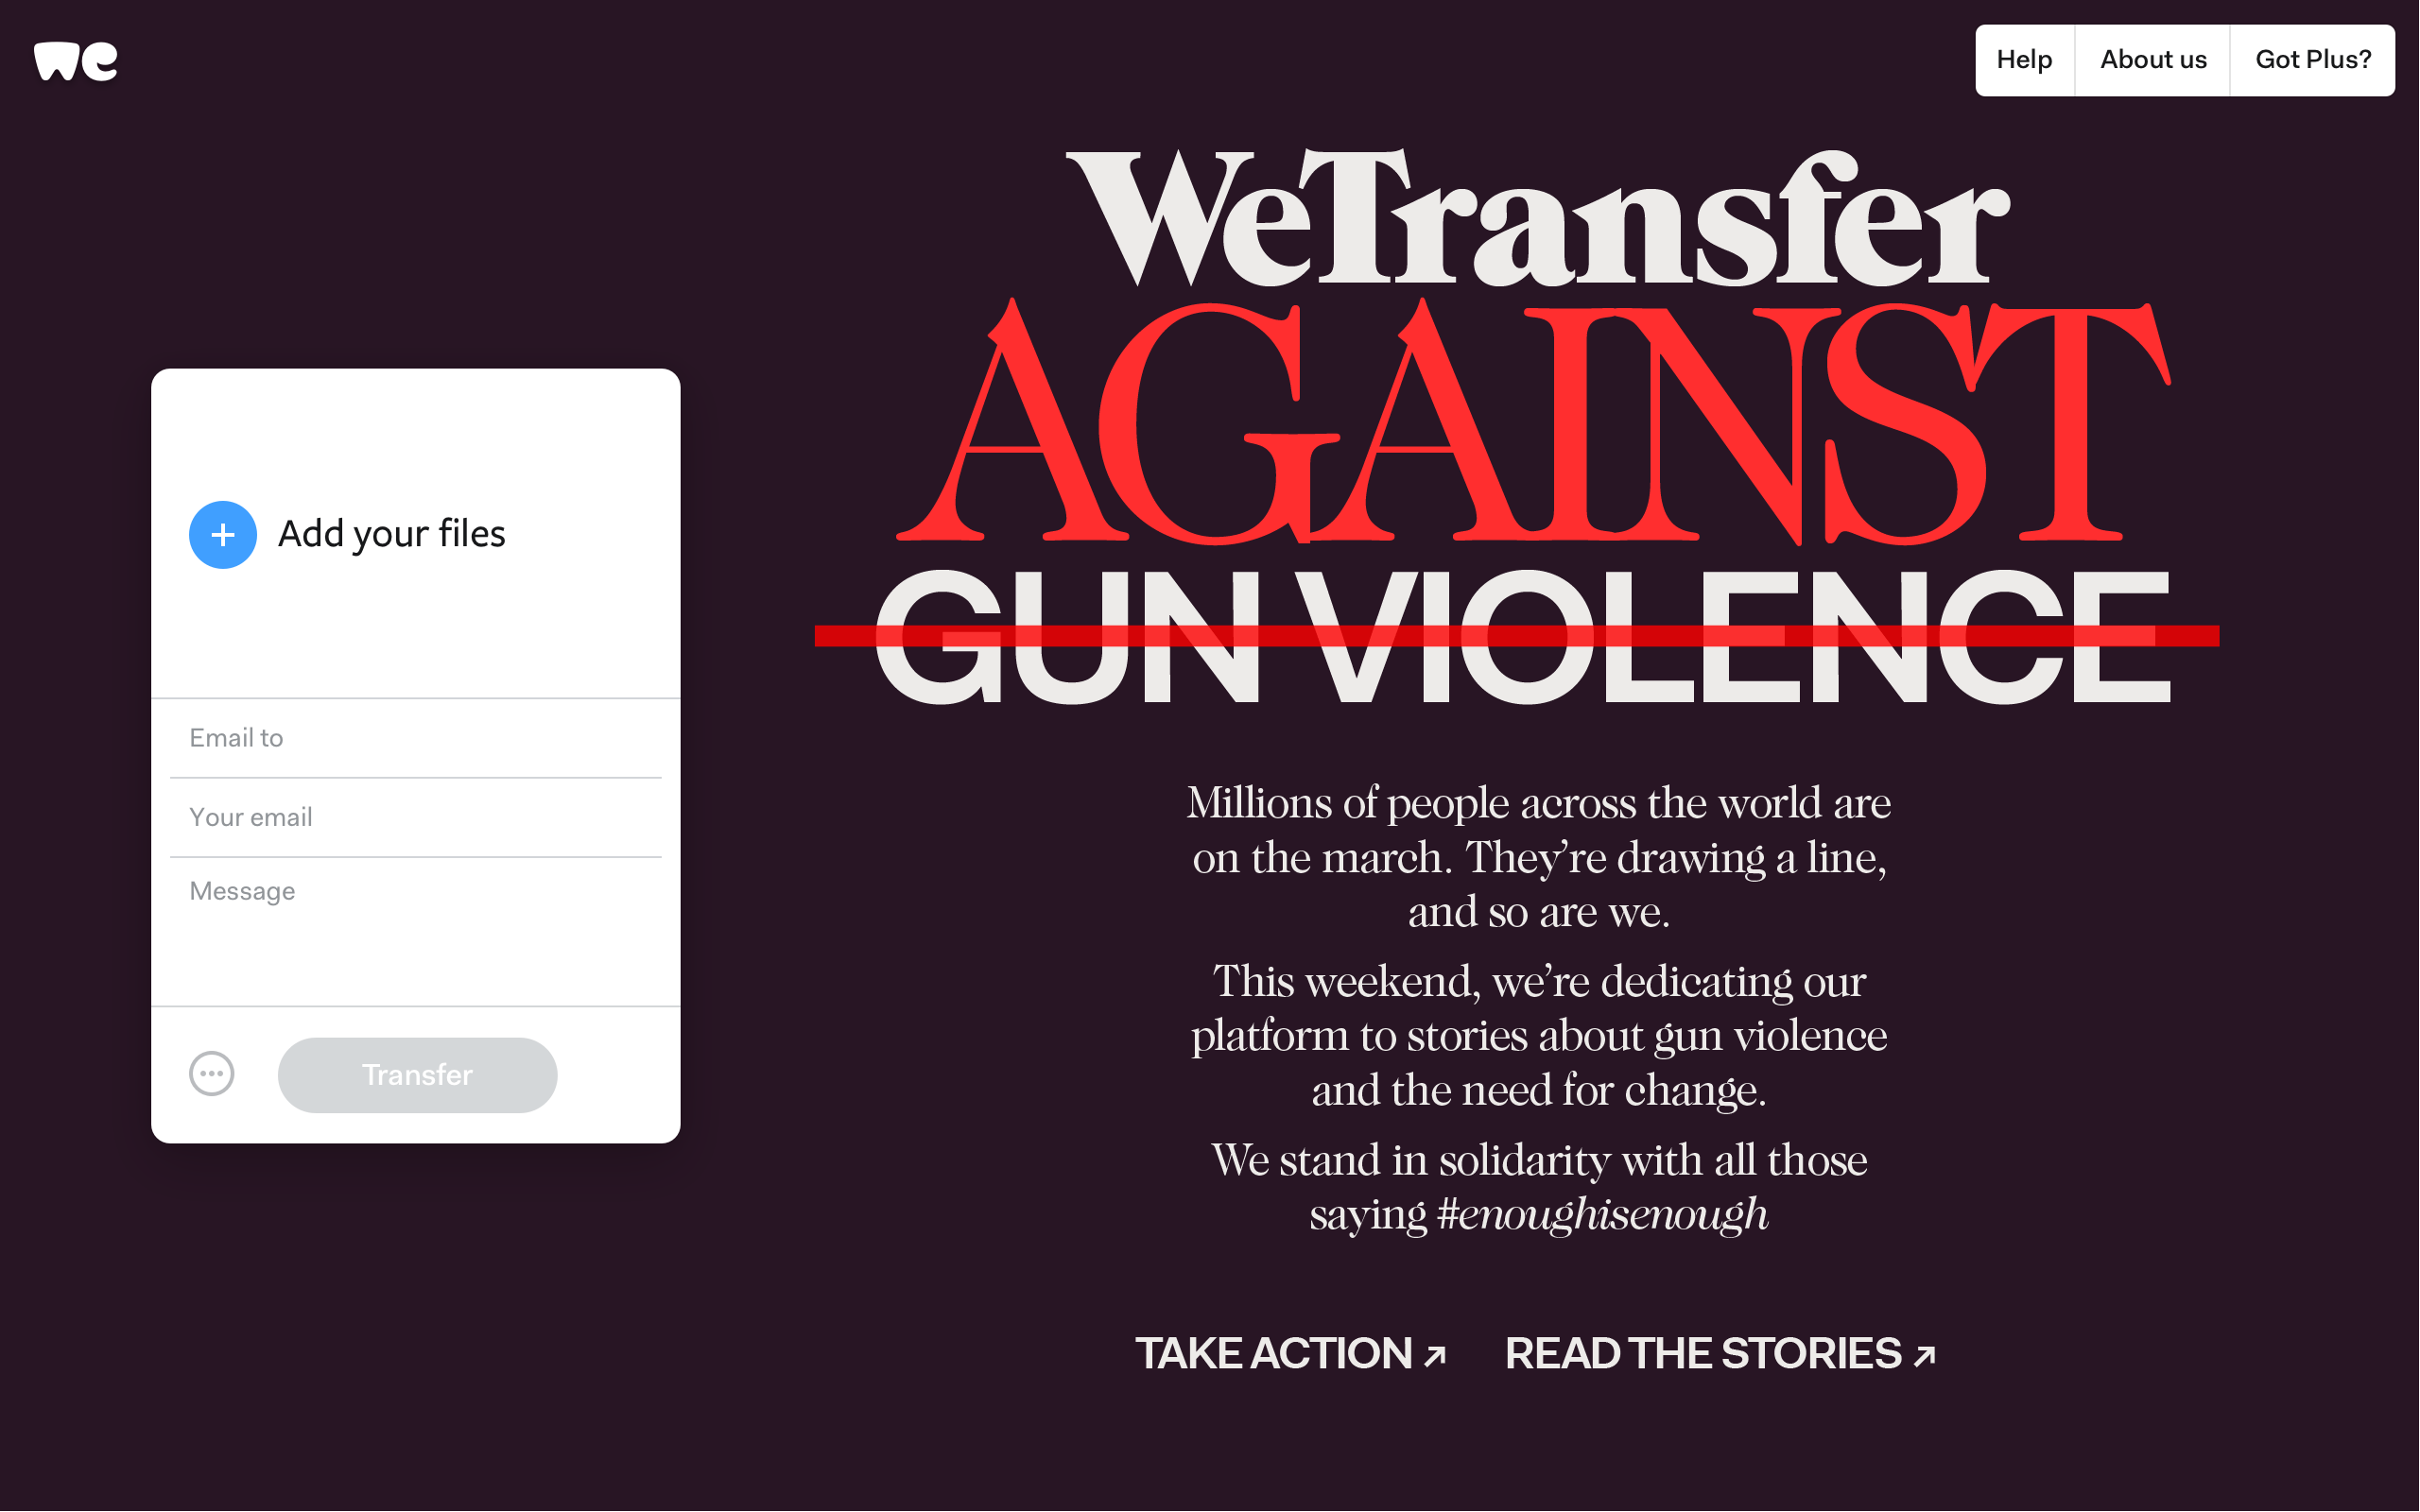 gunviolence-wallpaper.png